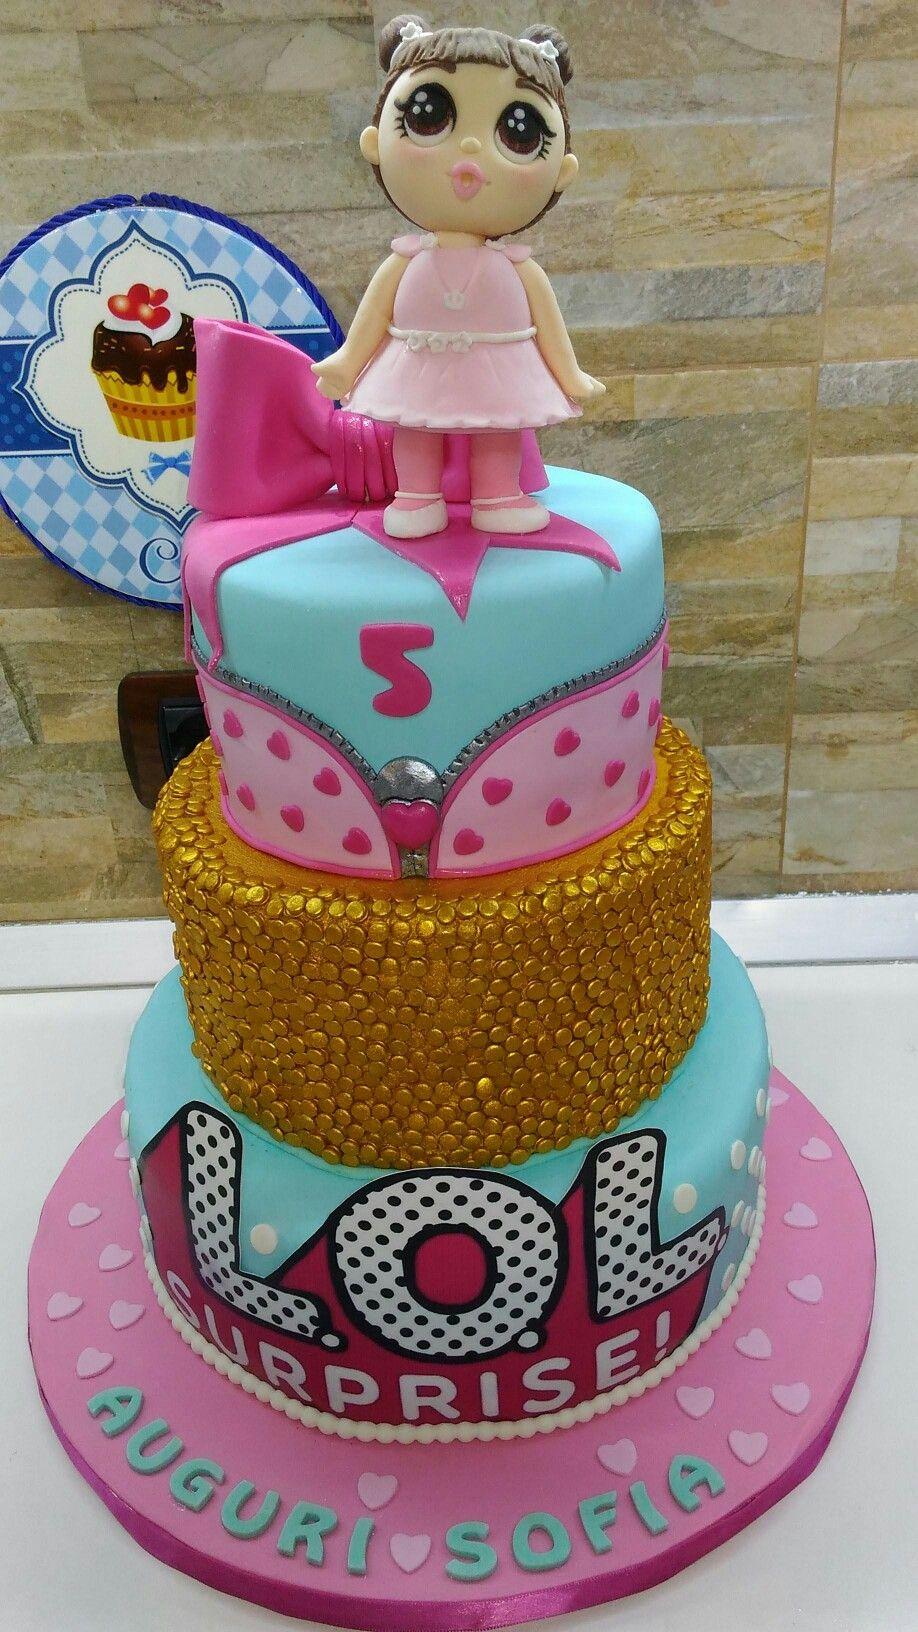 Torta Lol Surprise Lol Surprise cake!